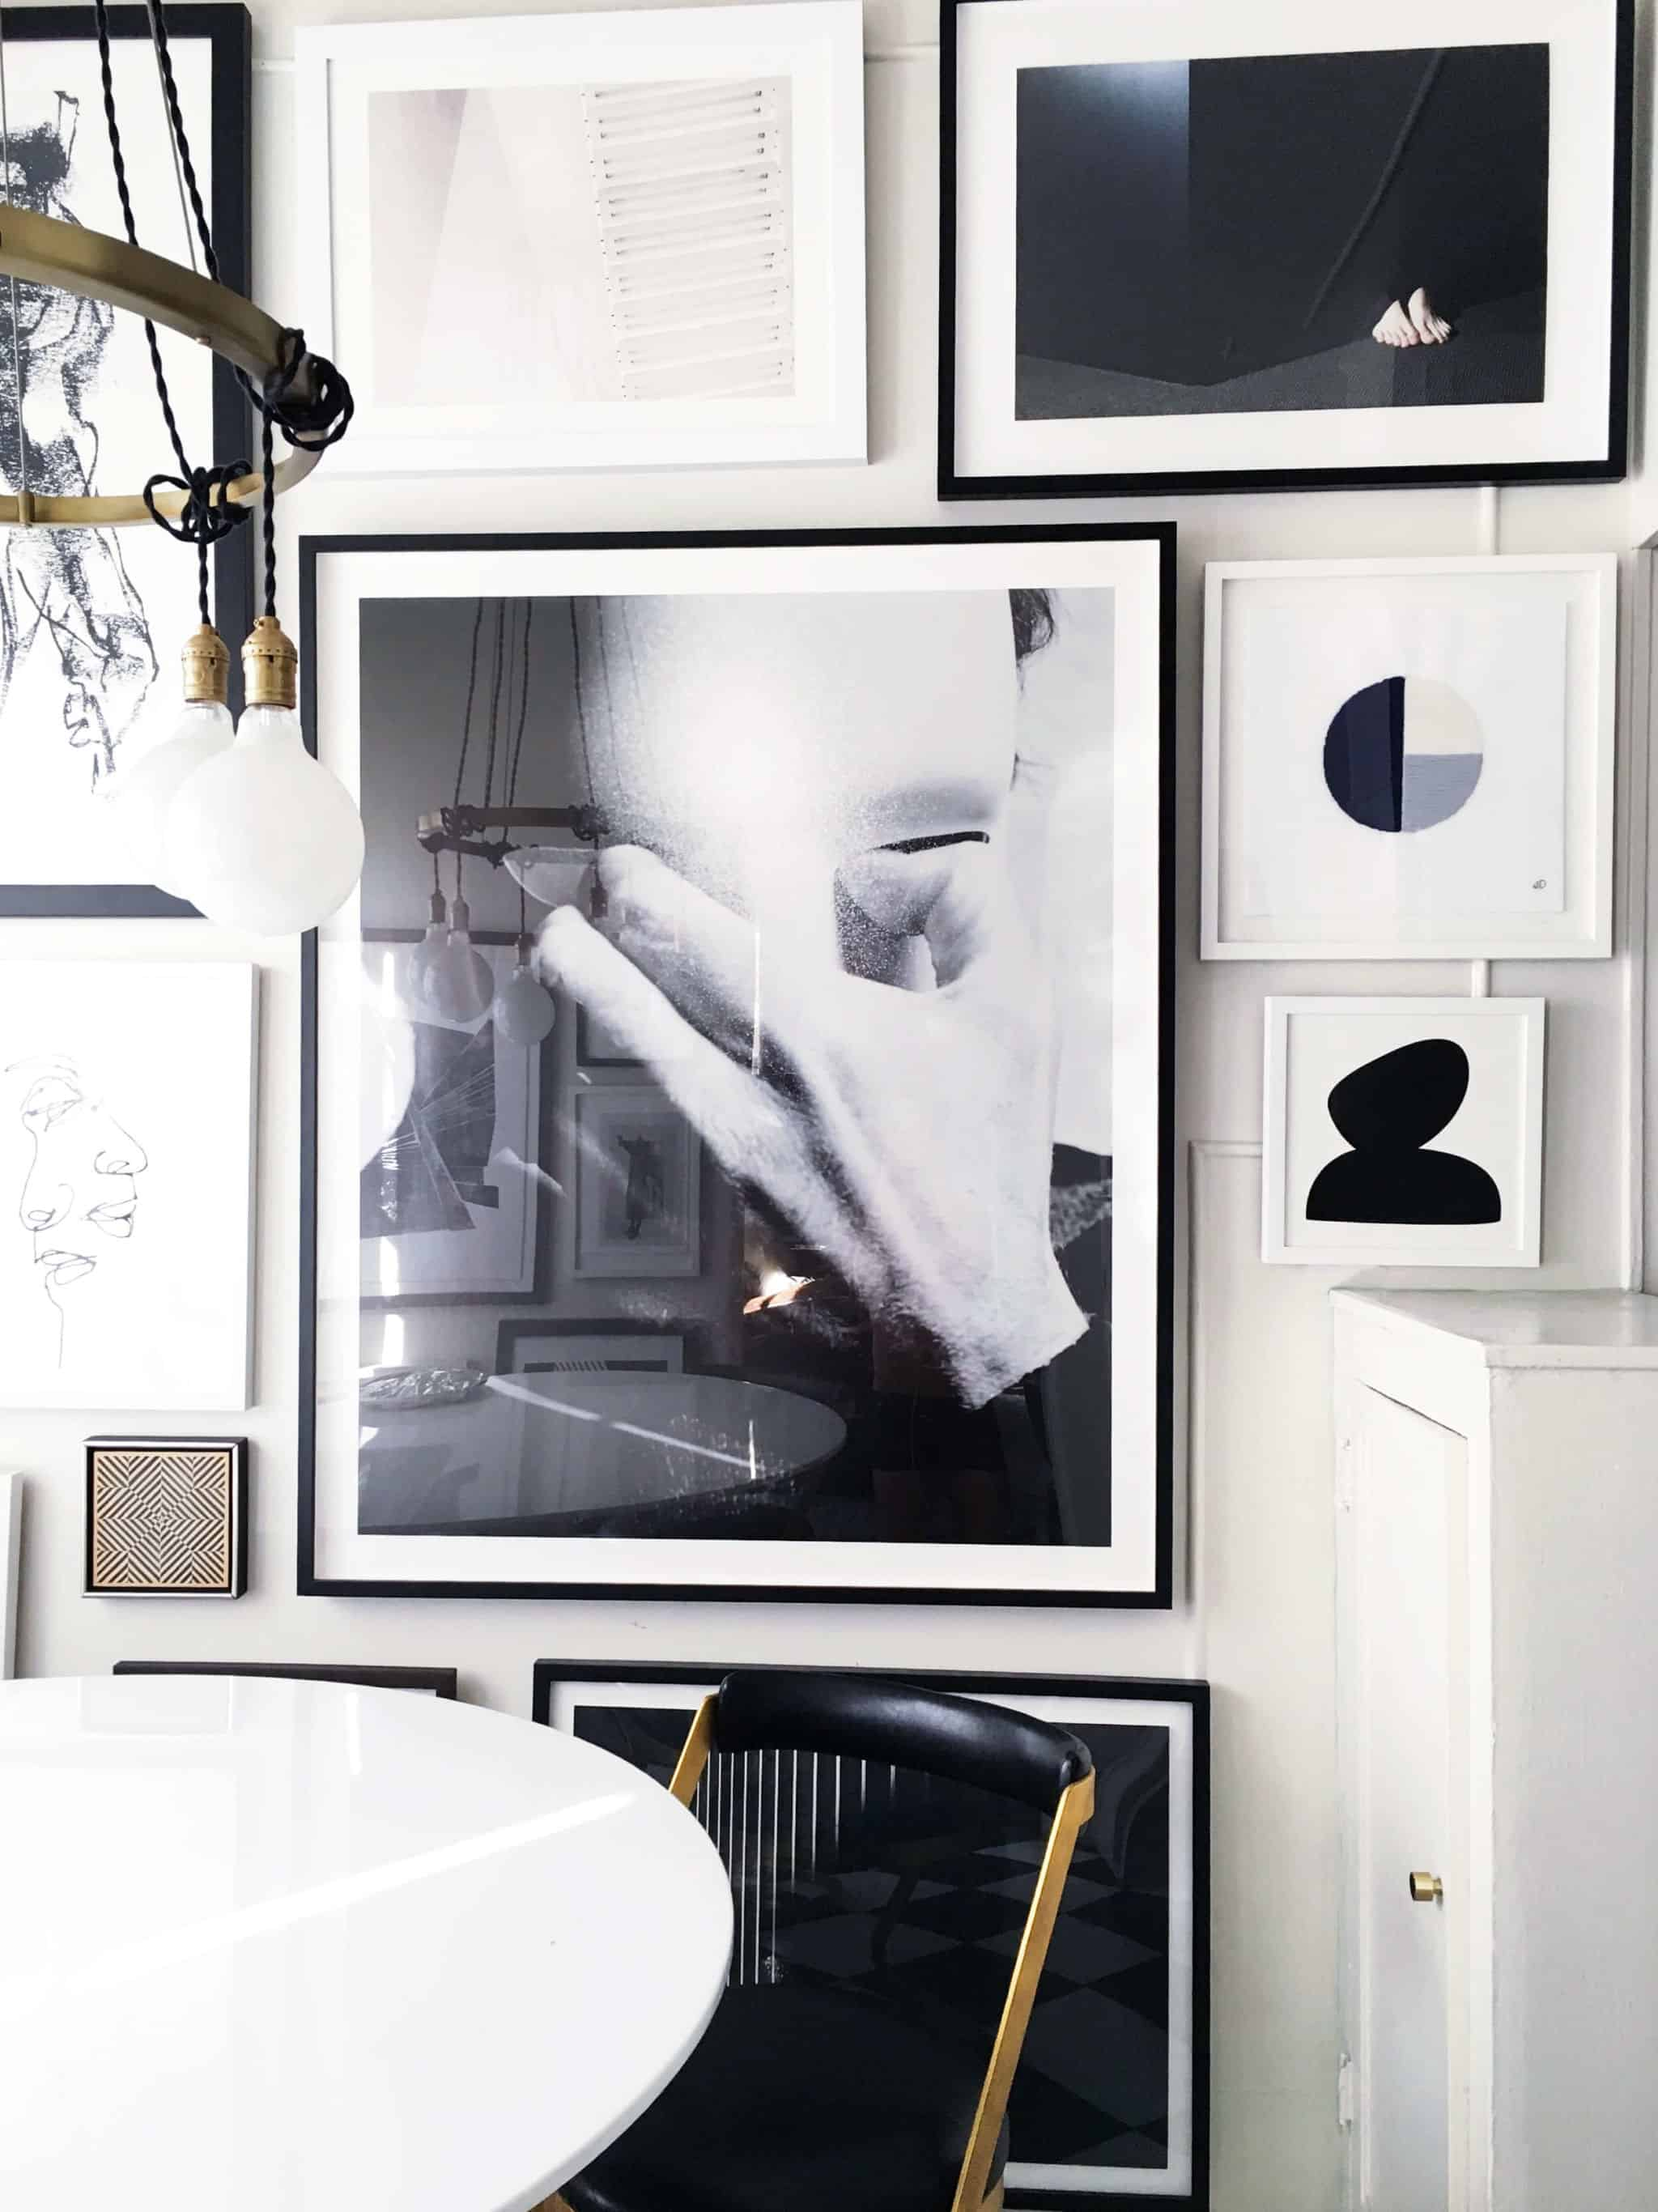 brady-tolbert_dining-room_gallery-wall_jane-denton_black-and-white_2